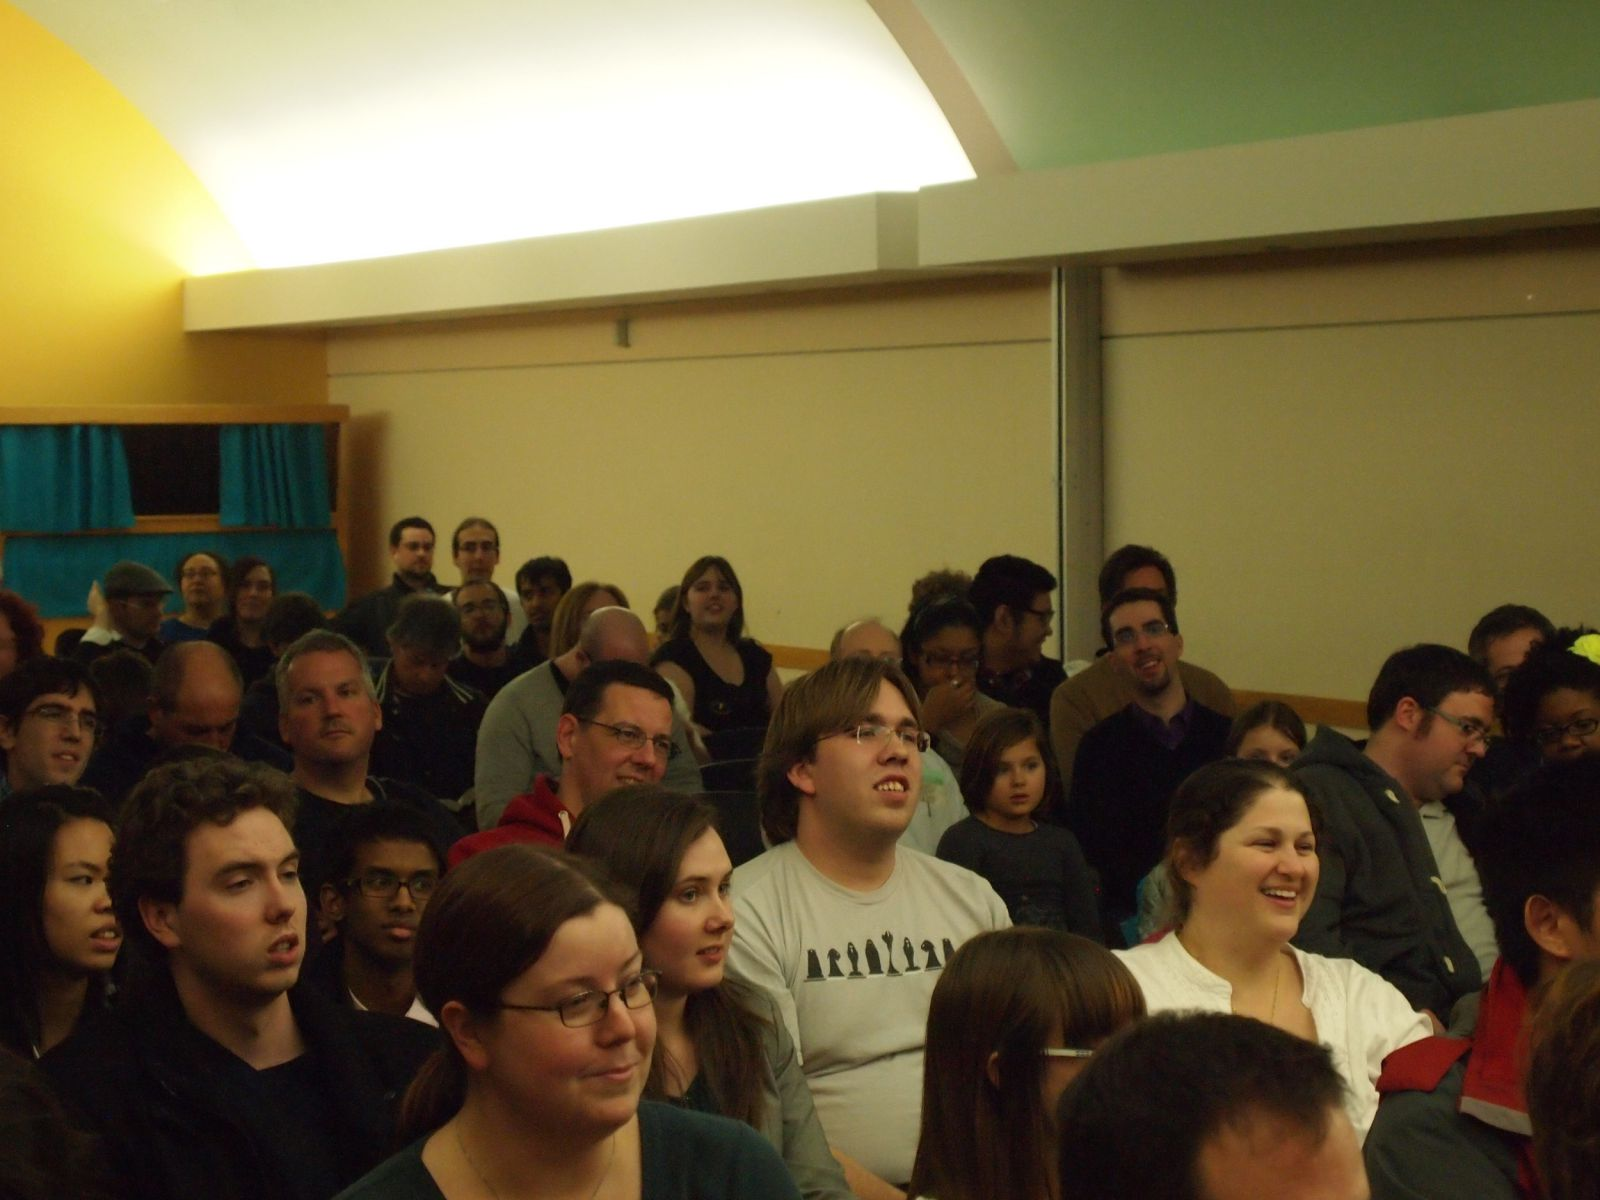 A full room